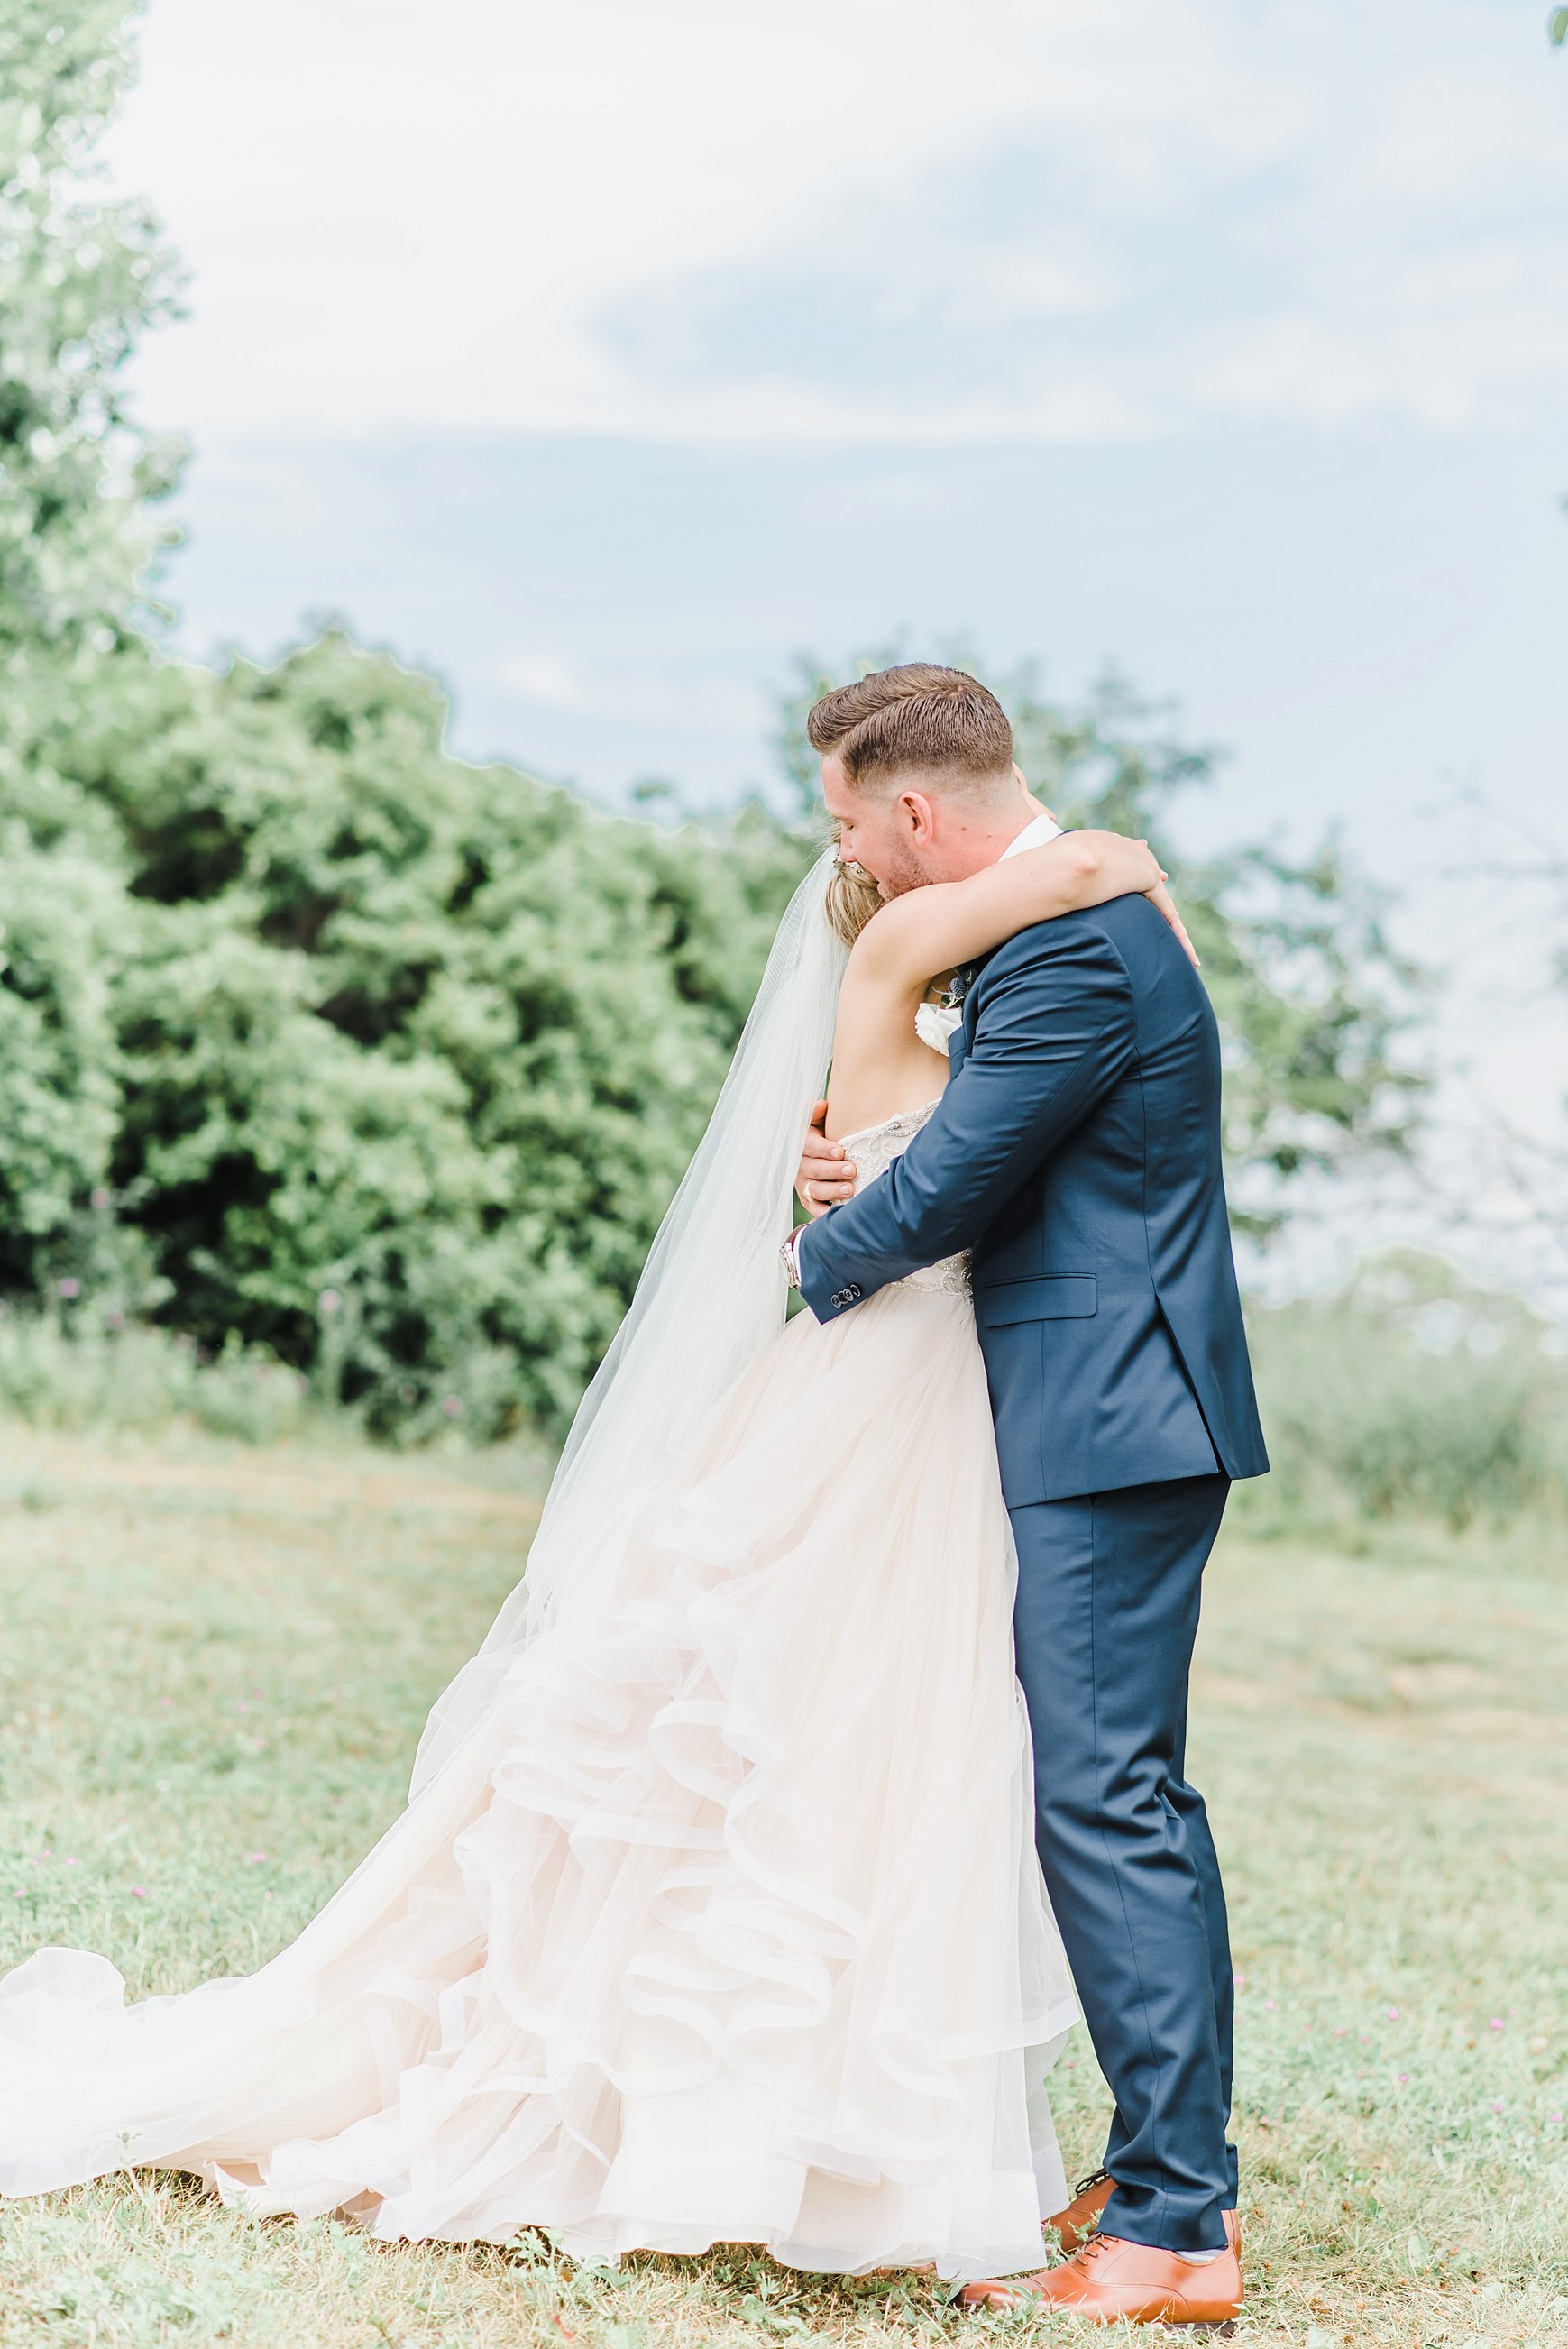 light airy indie fine art ottawa wedding photographer | Ali and Batoul Photography_0154.jpg